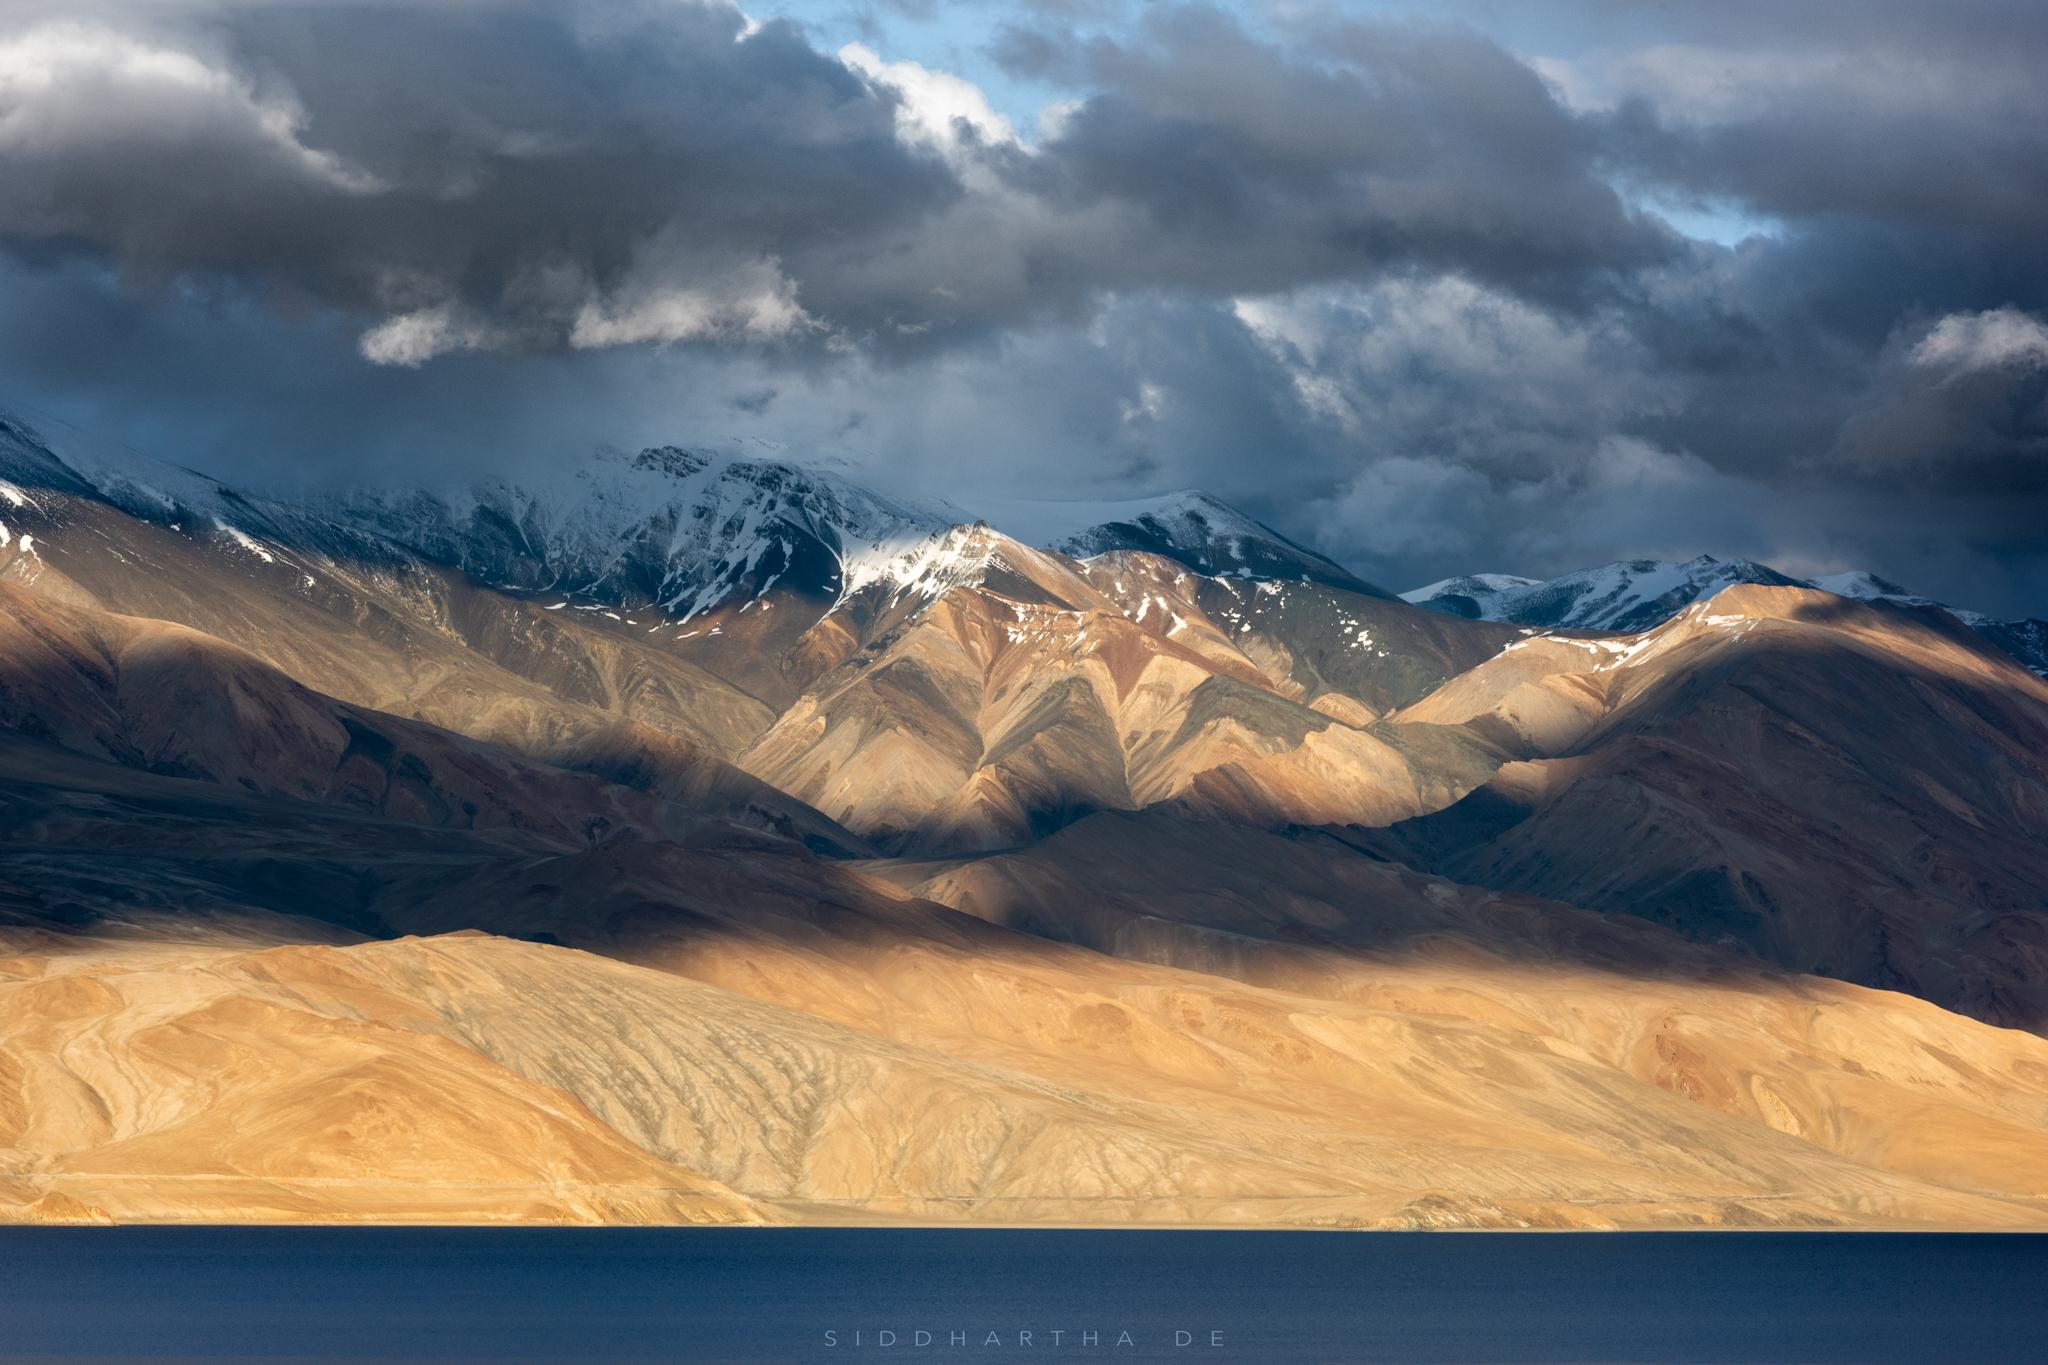 SD Ladakh 2019 22.jpg